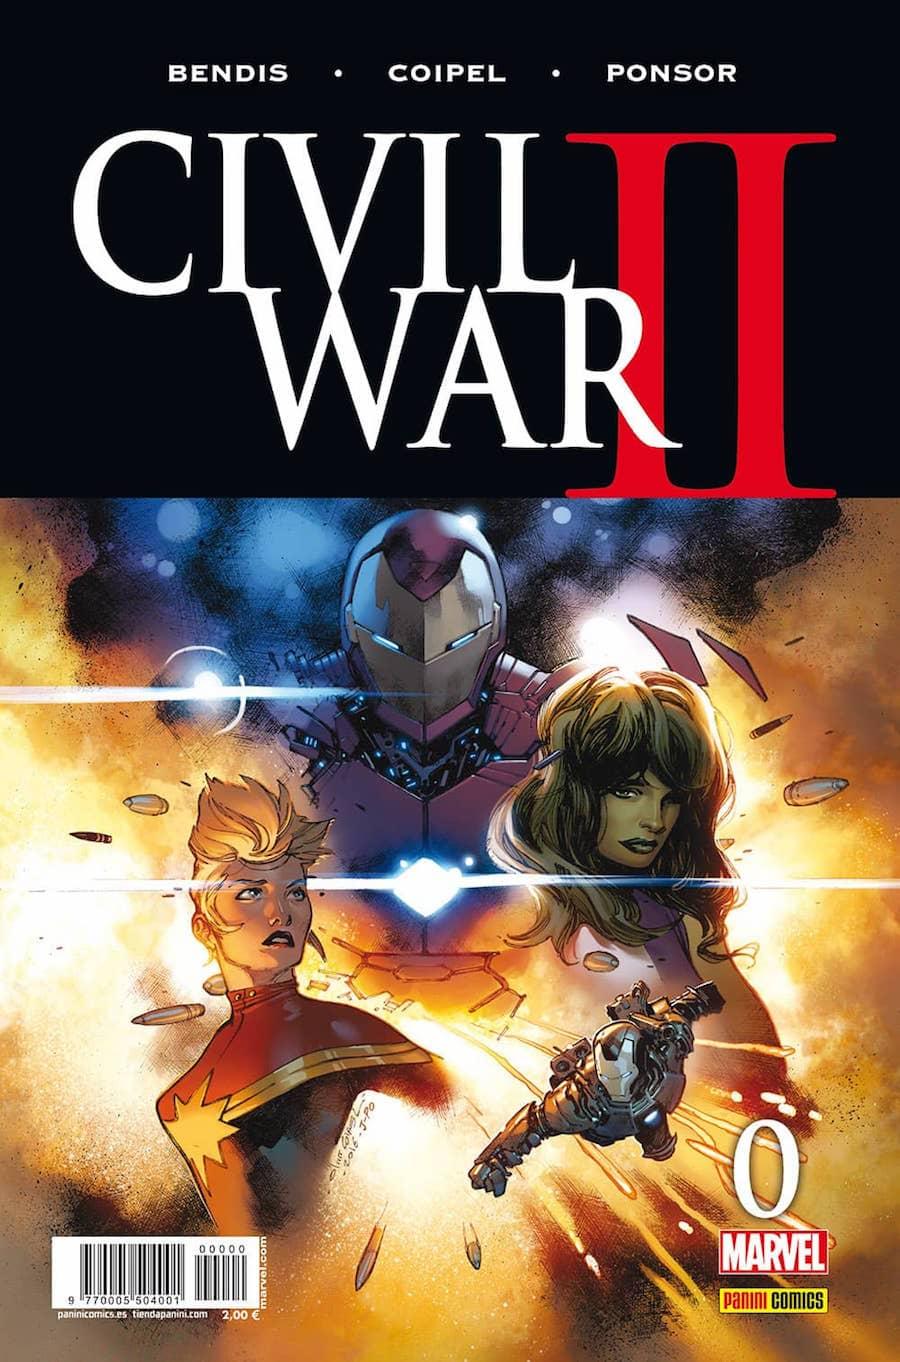 CIVIL WAR II N. 0